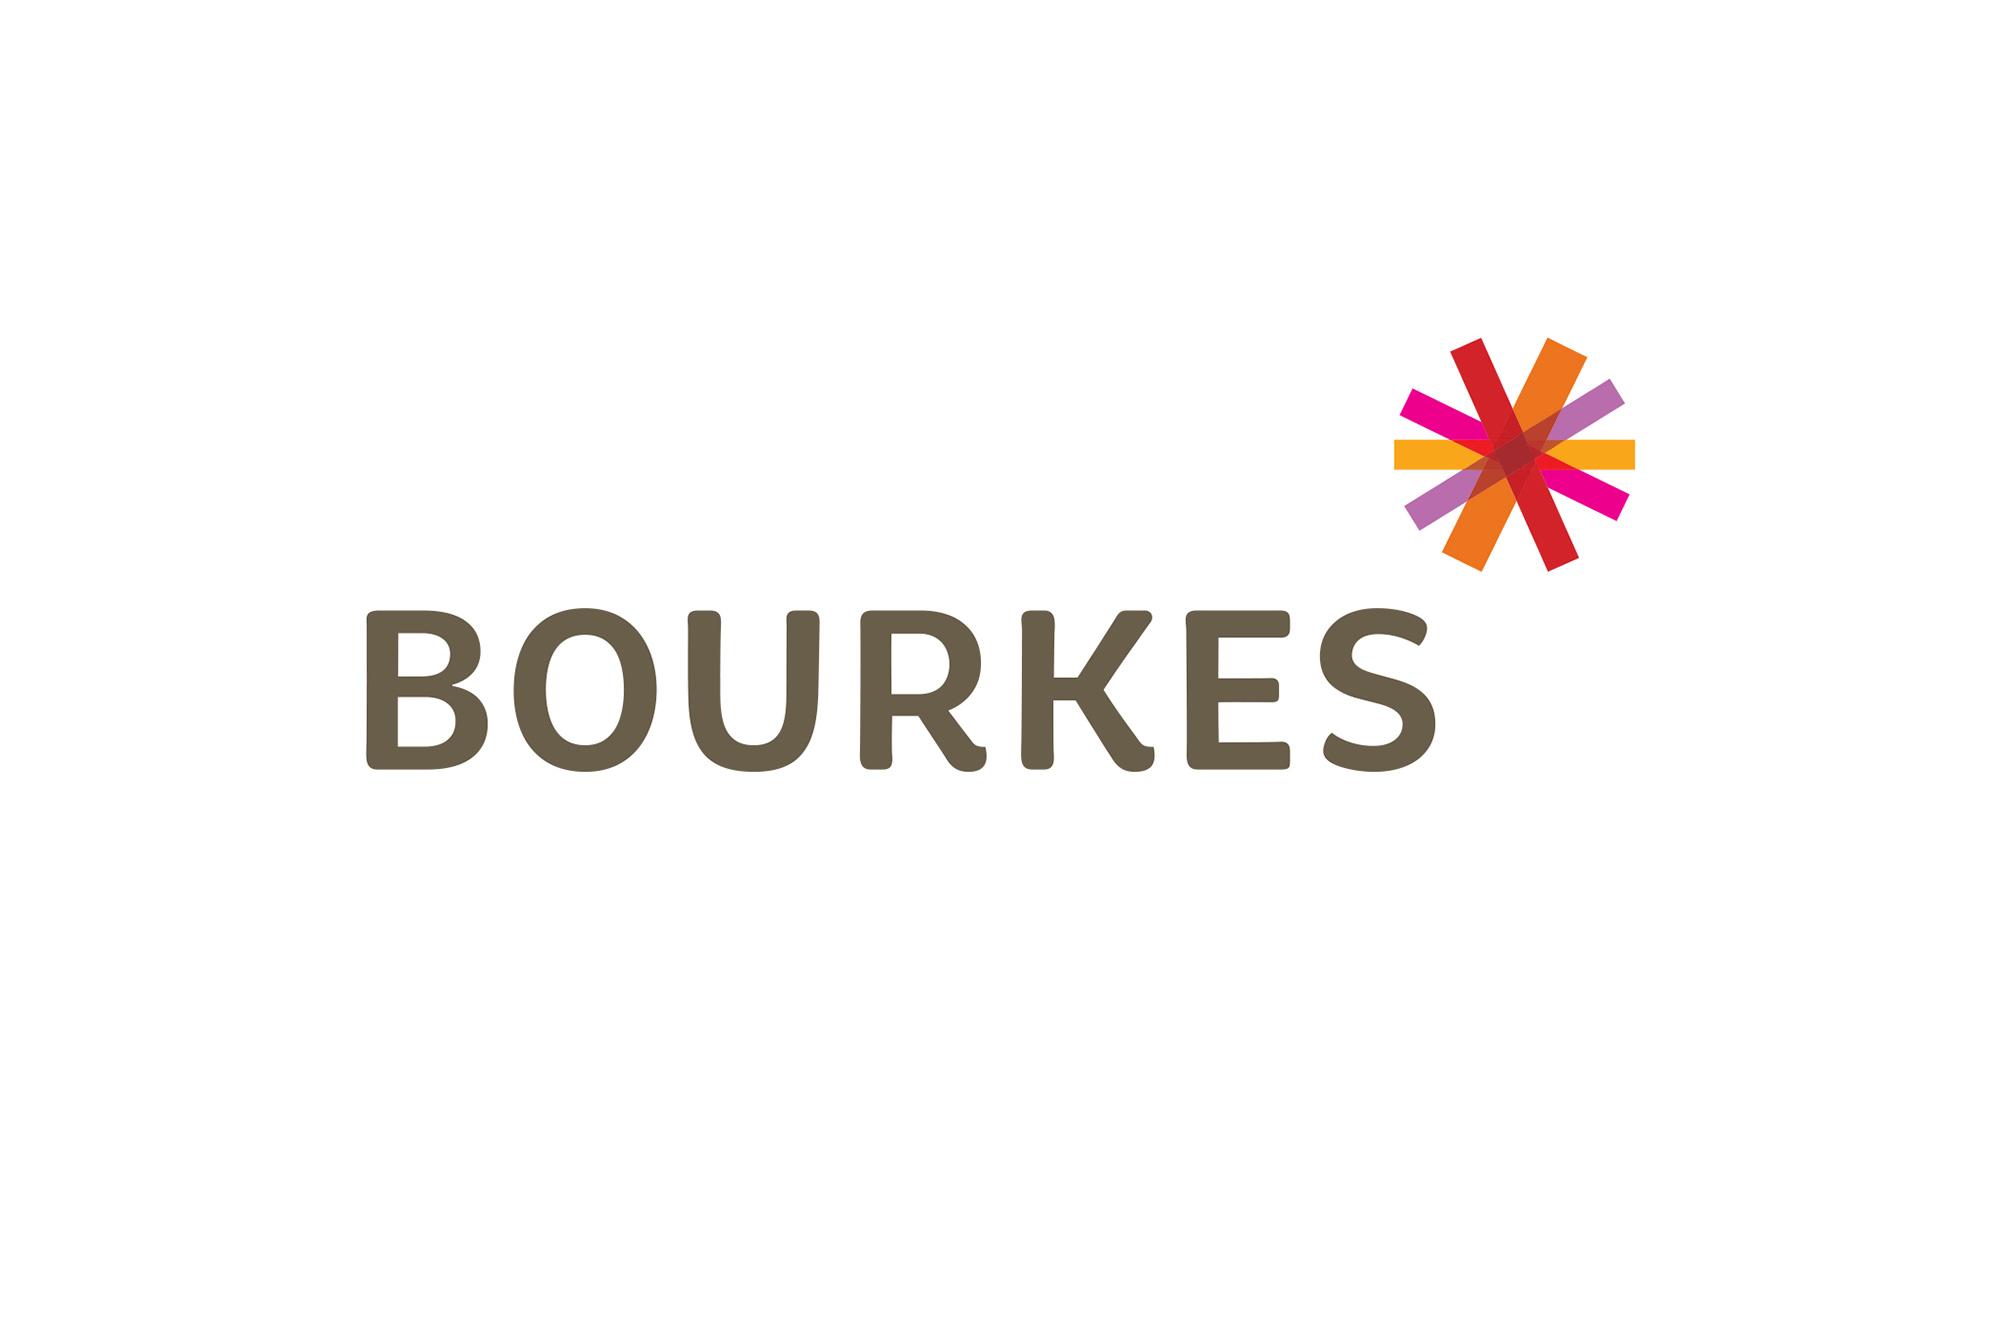 bourkes-realestate-logo